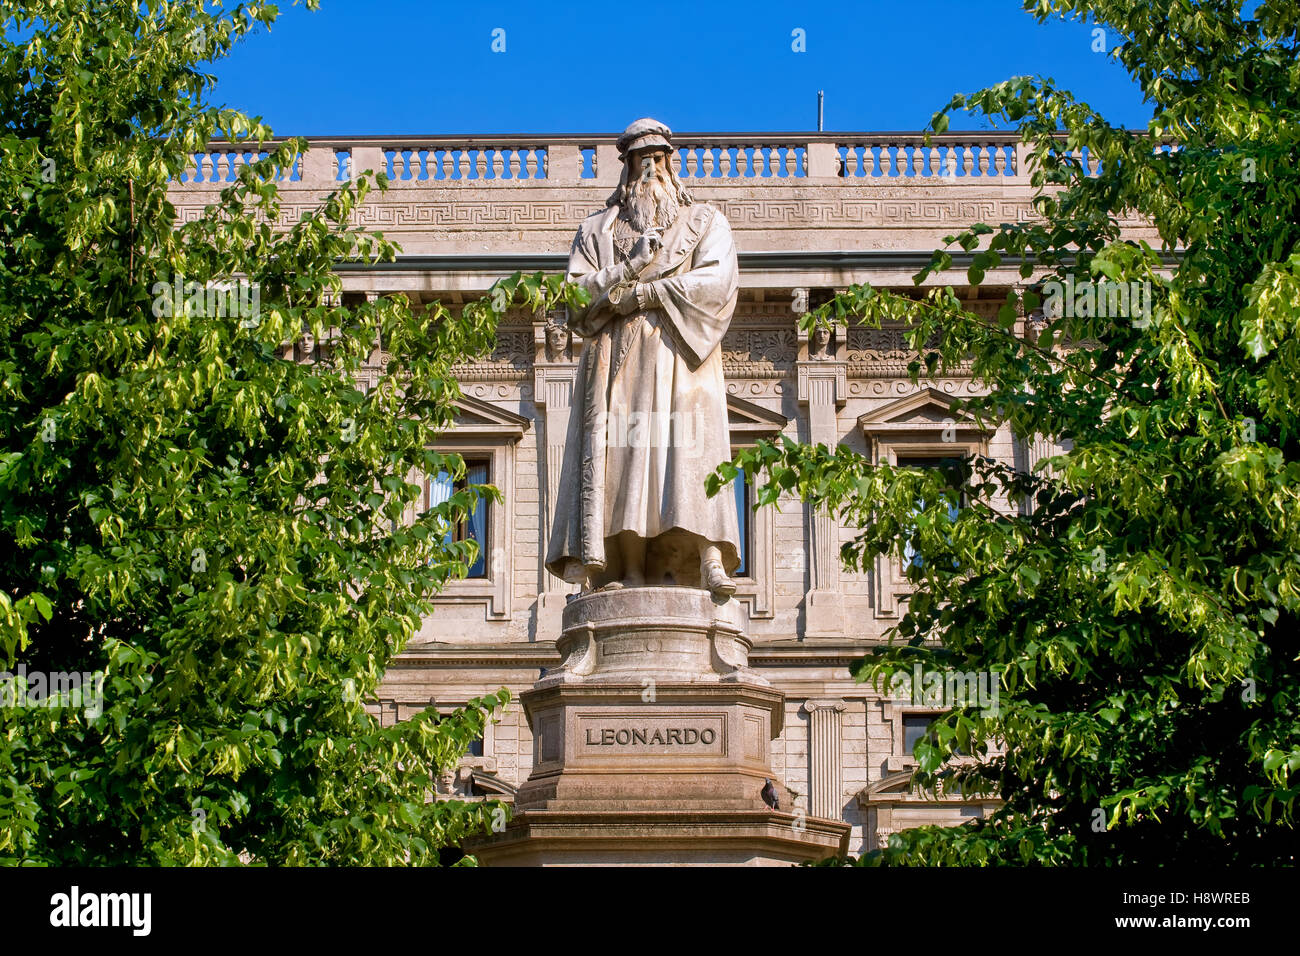 Statue of Leonard da Vinci, Milan, Italy - Stock Image